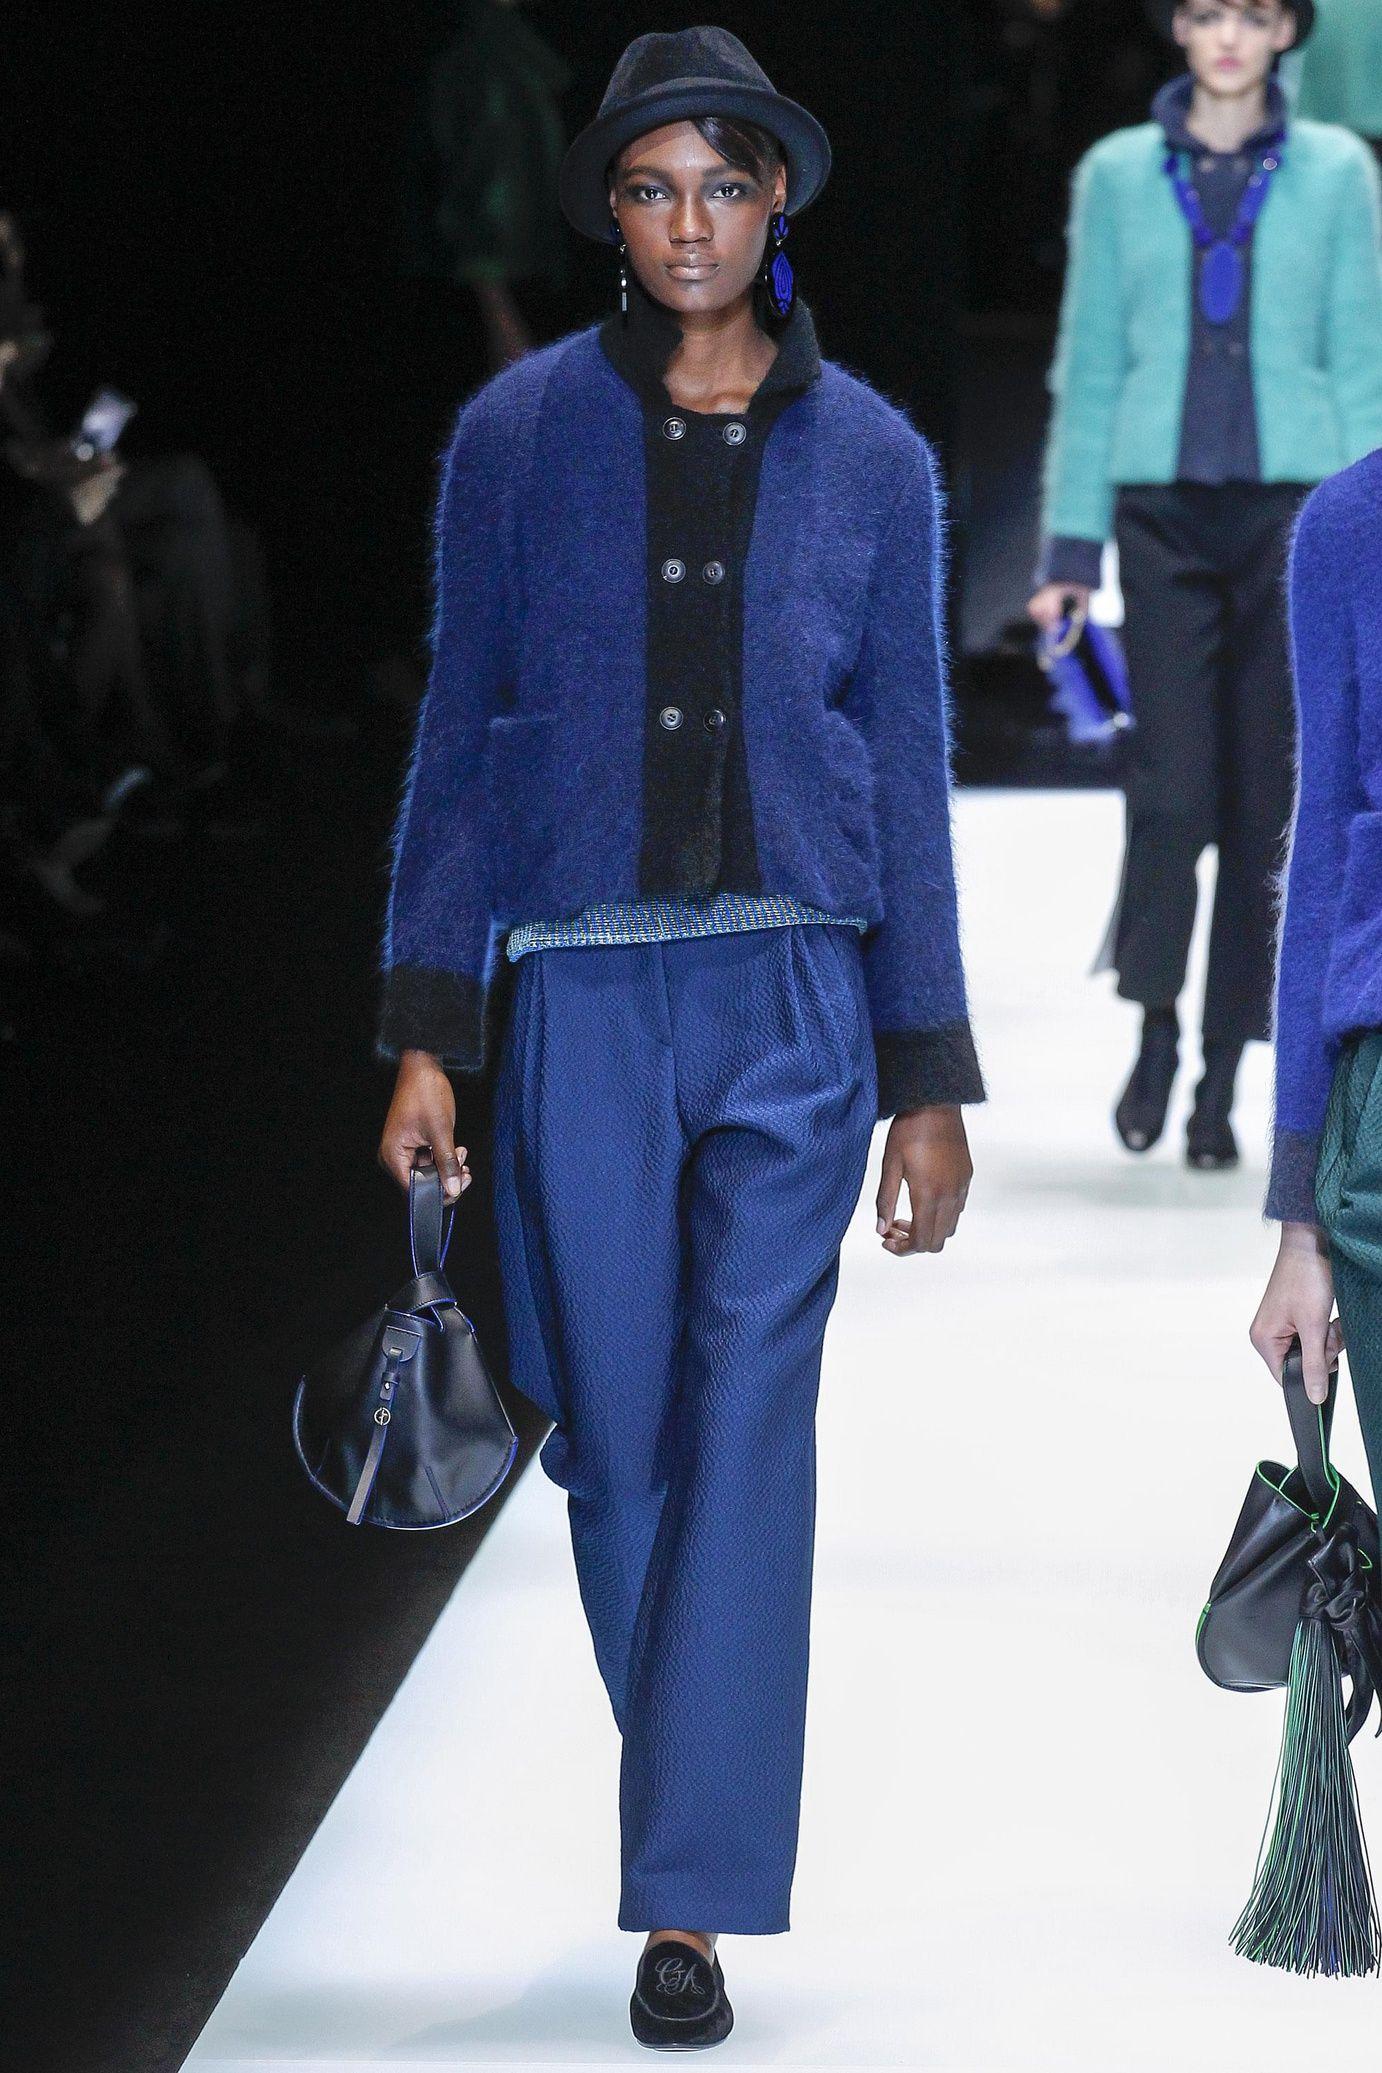 Défilé Giorgio Armani prêt-à-porter femme automne-hiver 2017-2018 26